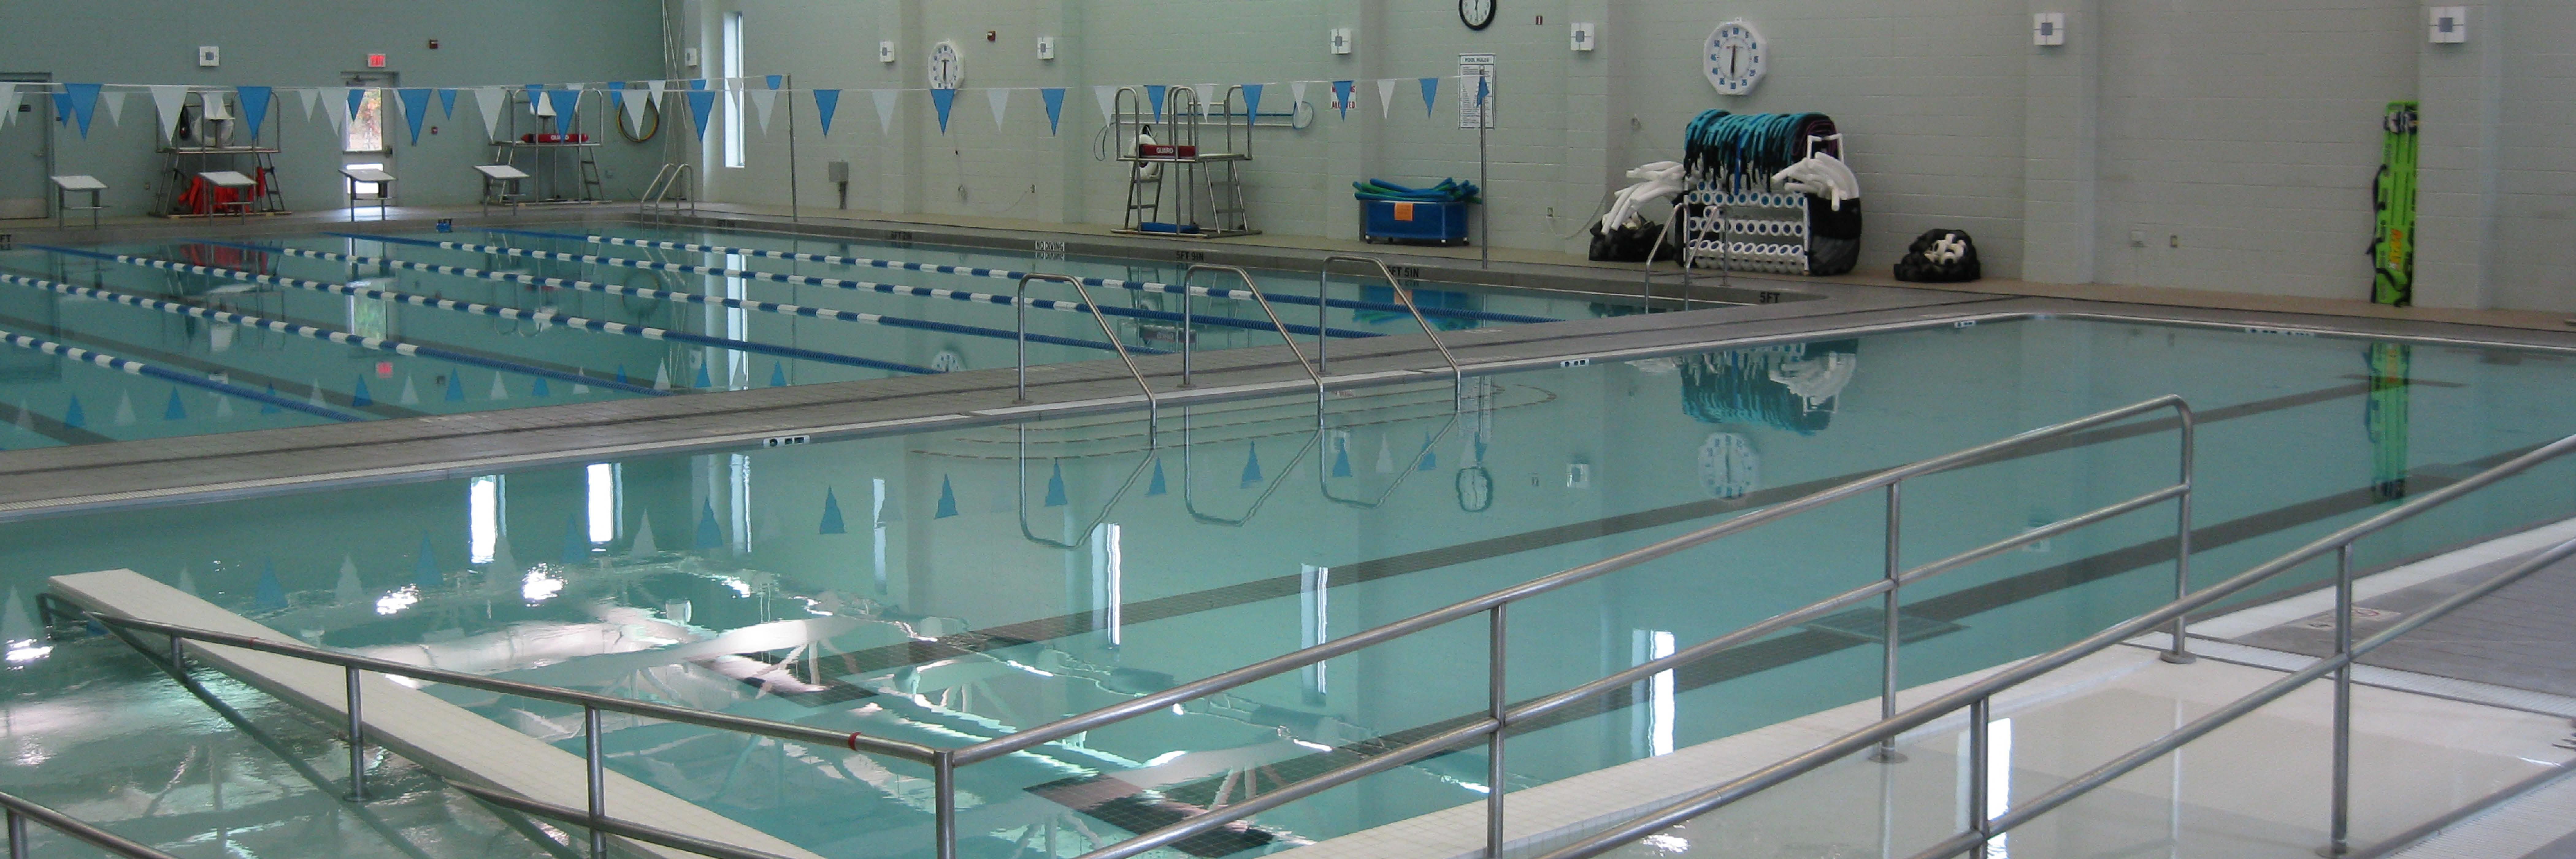 BCC Dinah Gore Aquatic Center